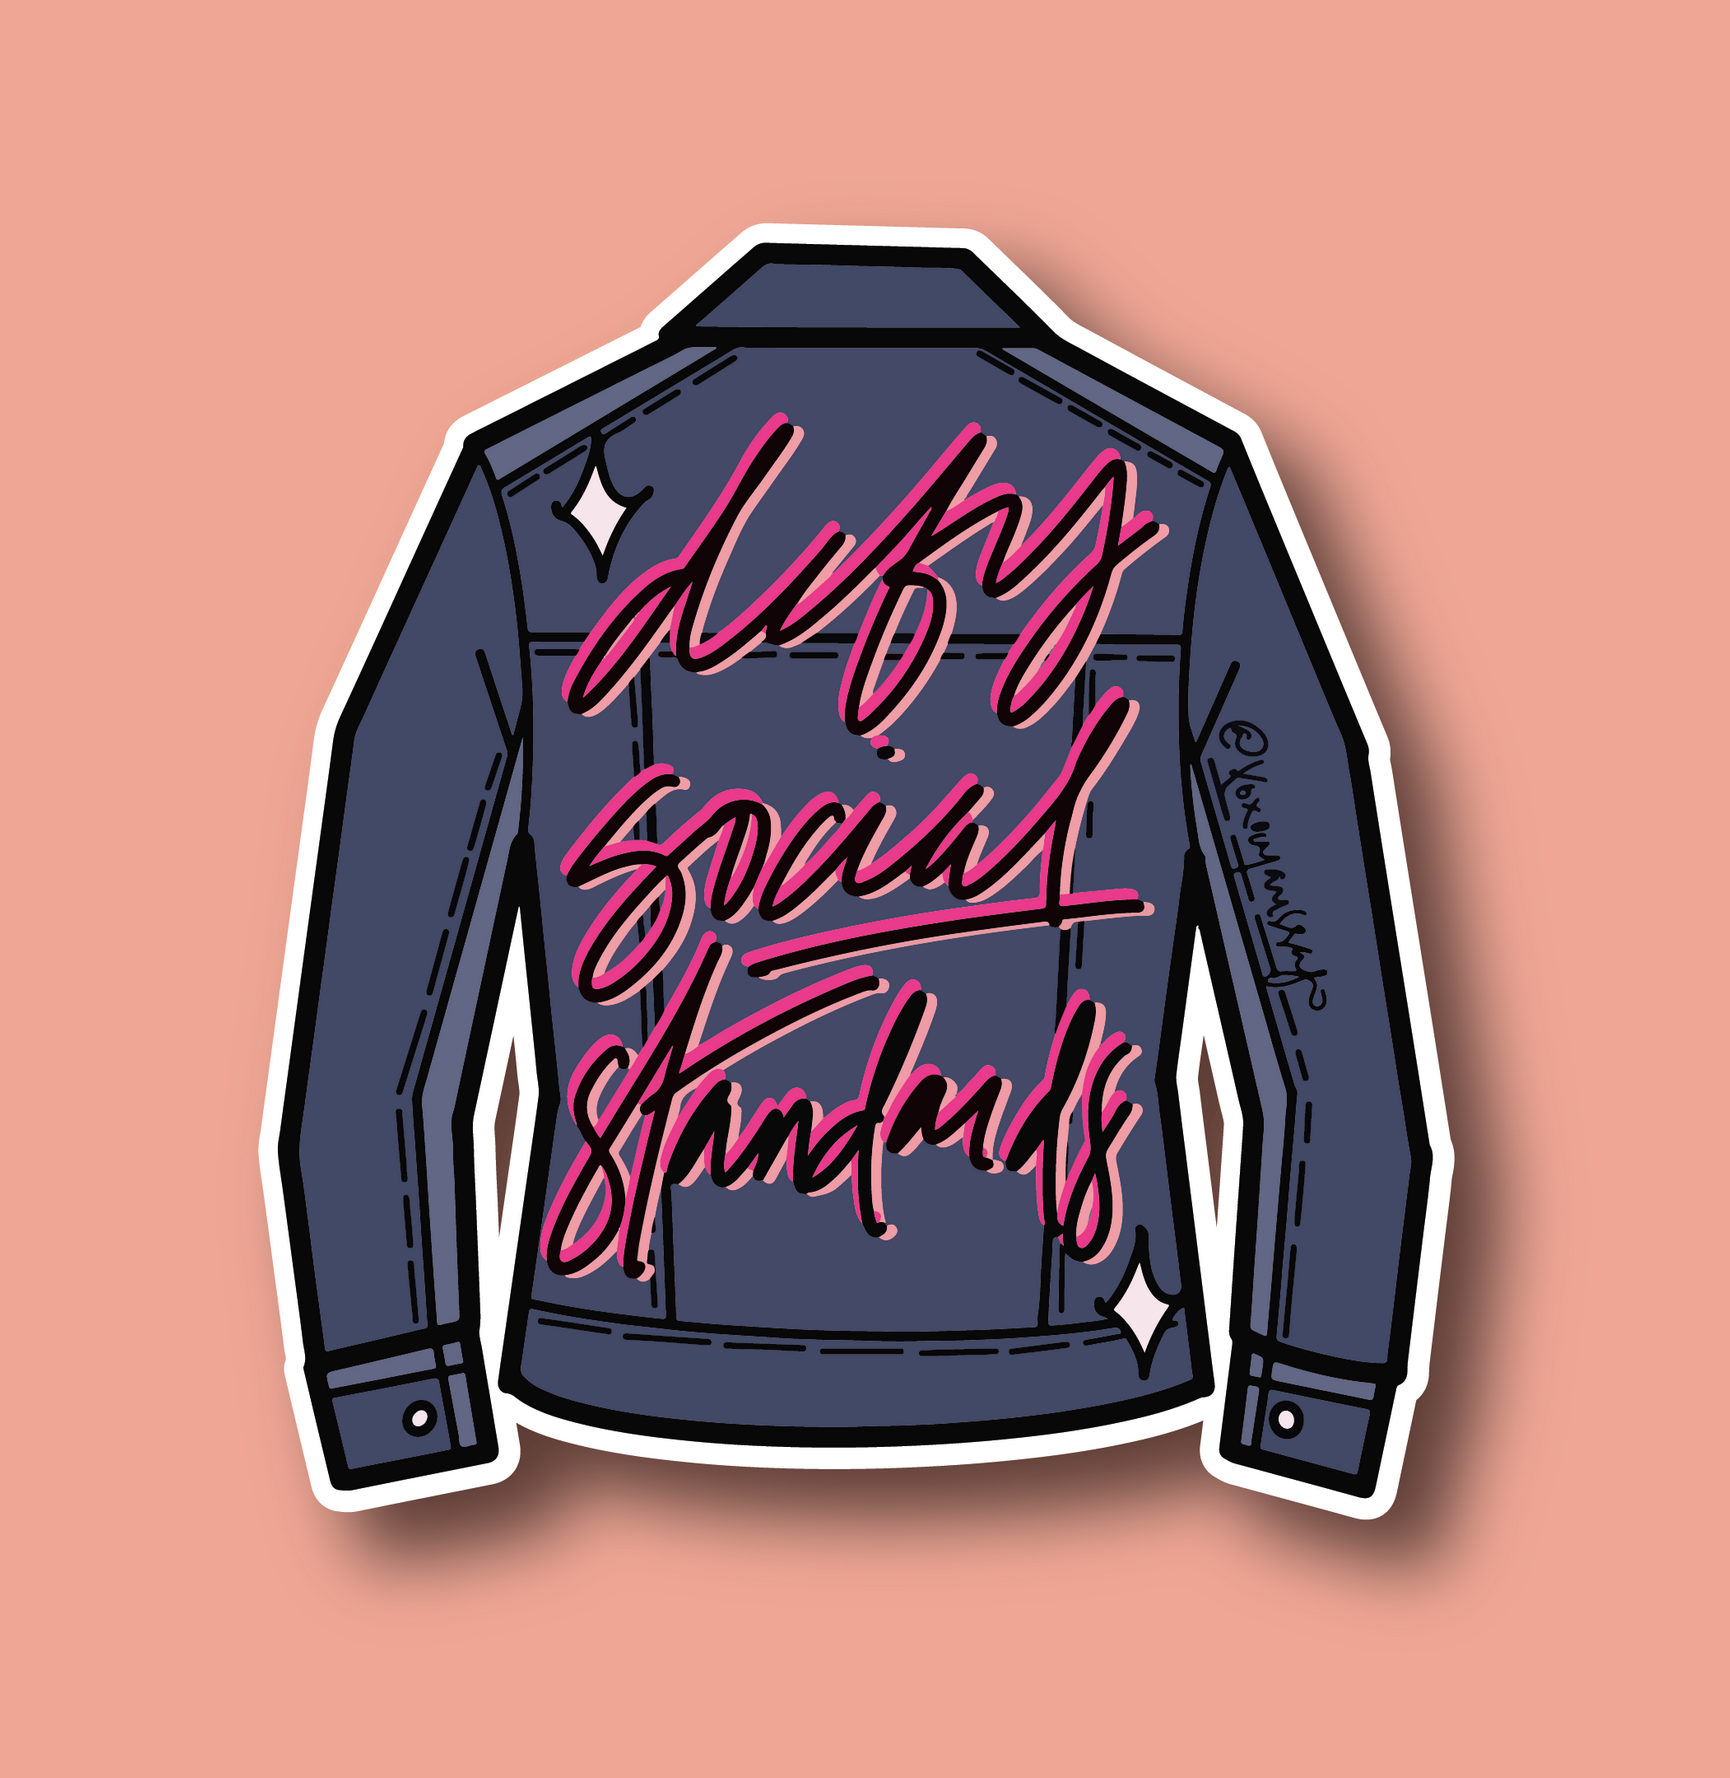 Marissa Monroe Studio Defy Social Standards Sticker-FINAL SALE